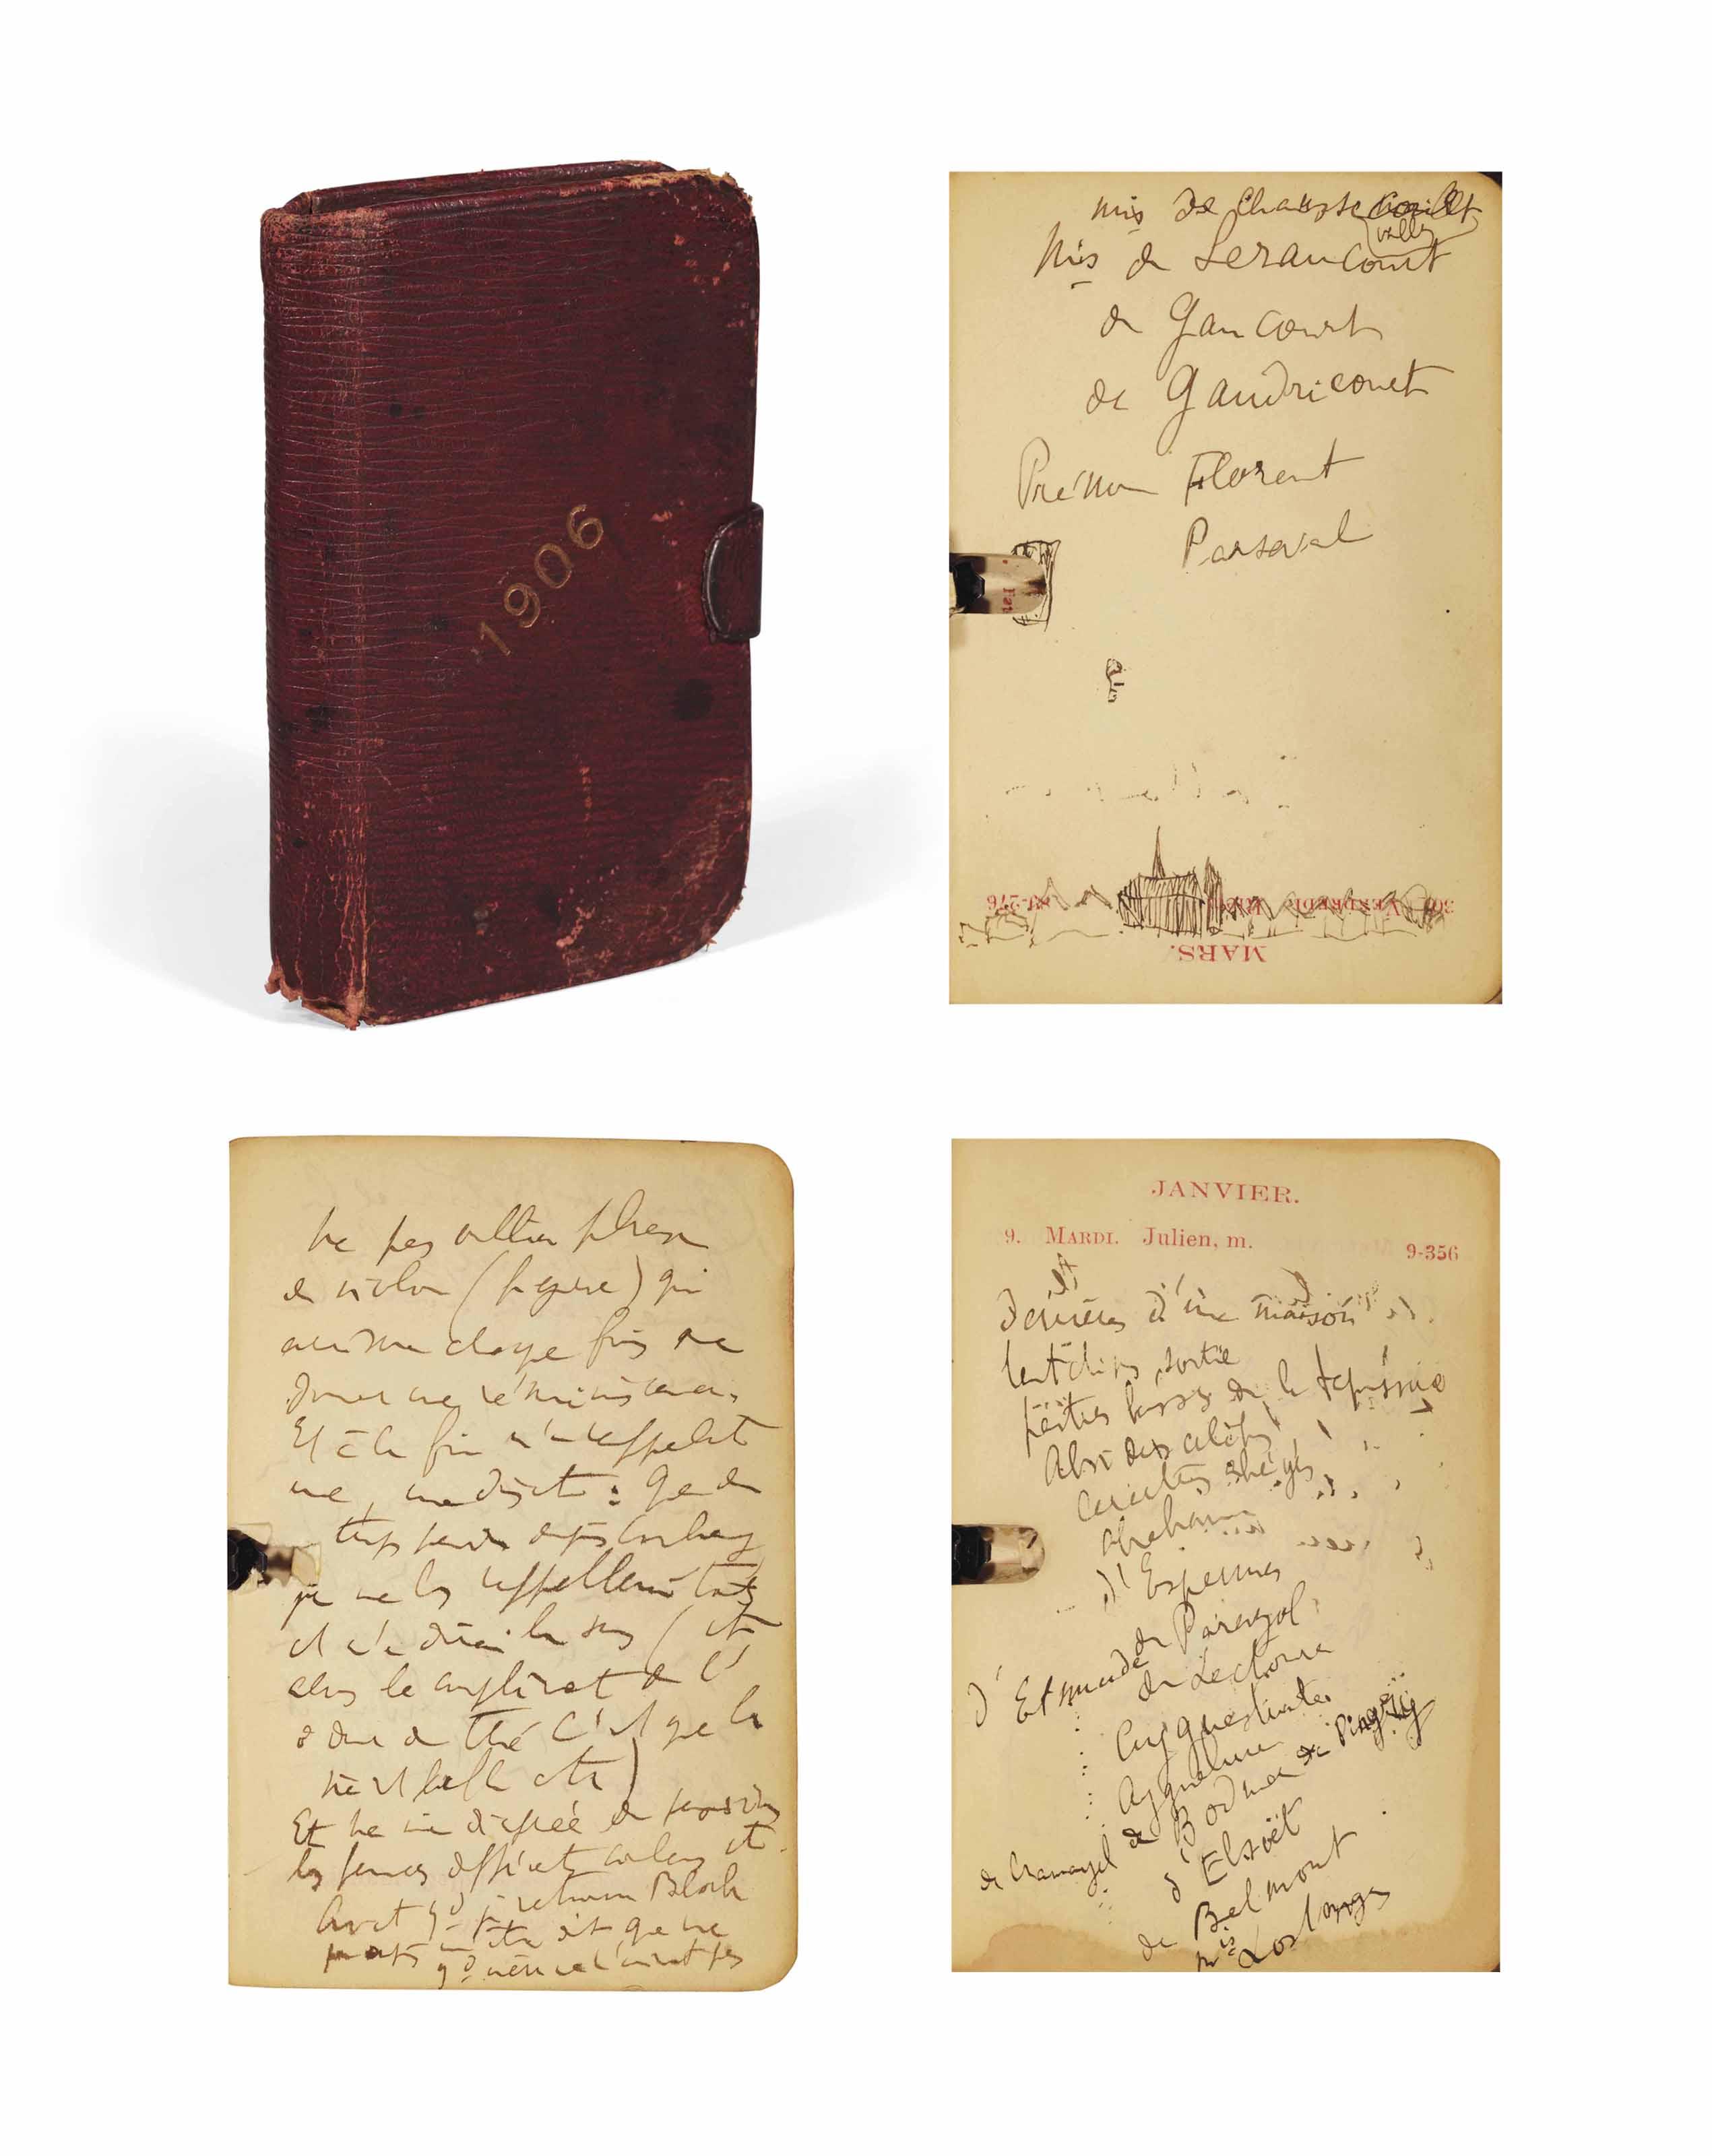 PROUST, Marcel (1871-1922). Agenda janvier-mars 1906. Kirby, Beard & Co. [Entre 1908 et 1911].